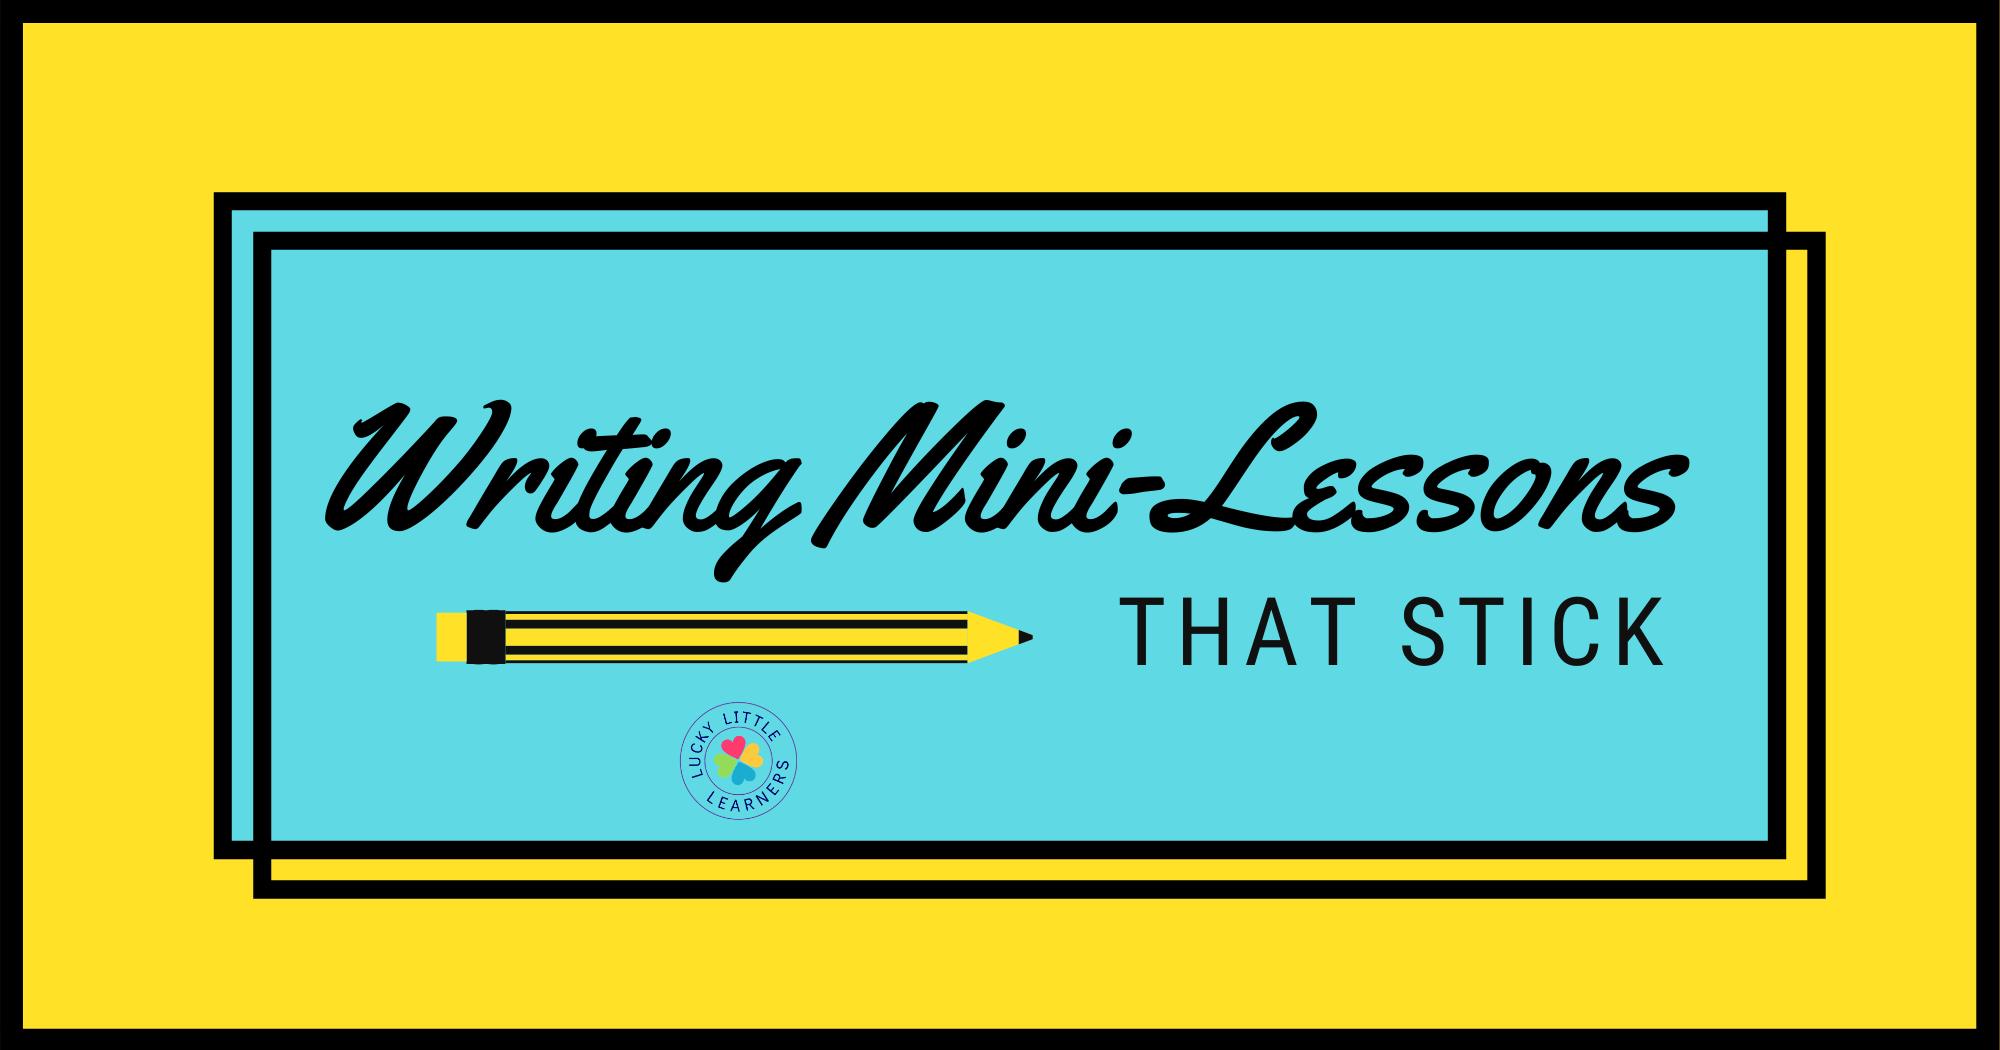 Writing Mini-Lessons That Stick